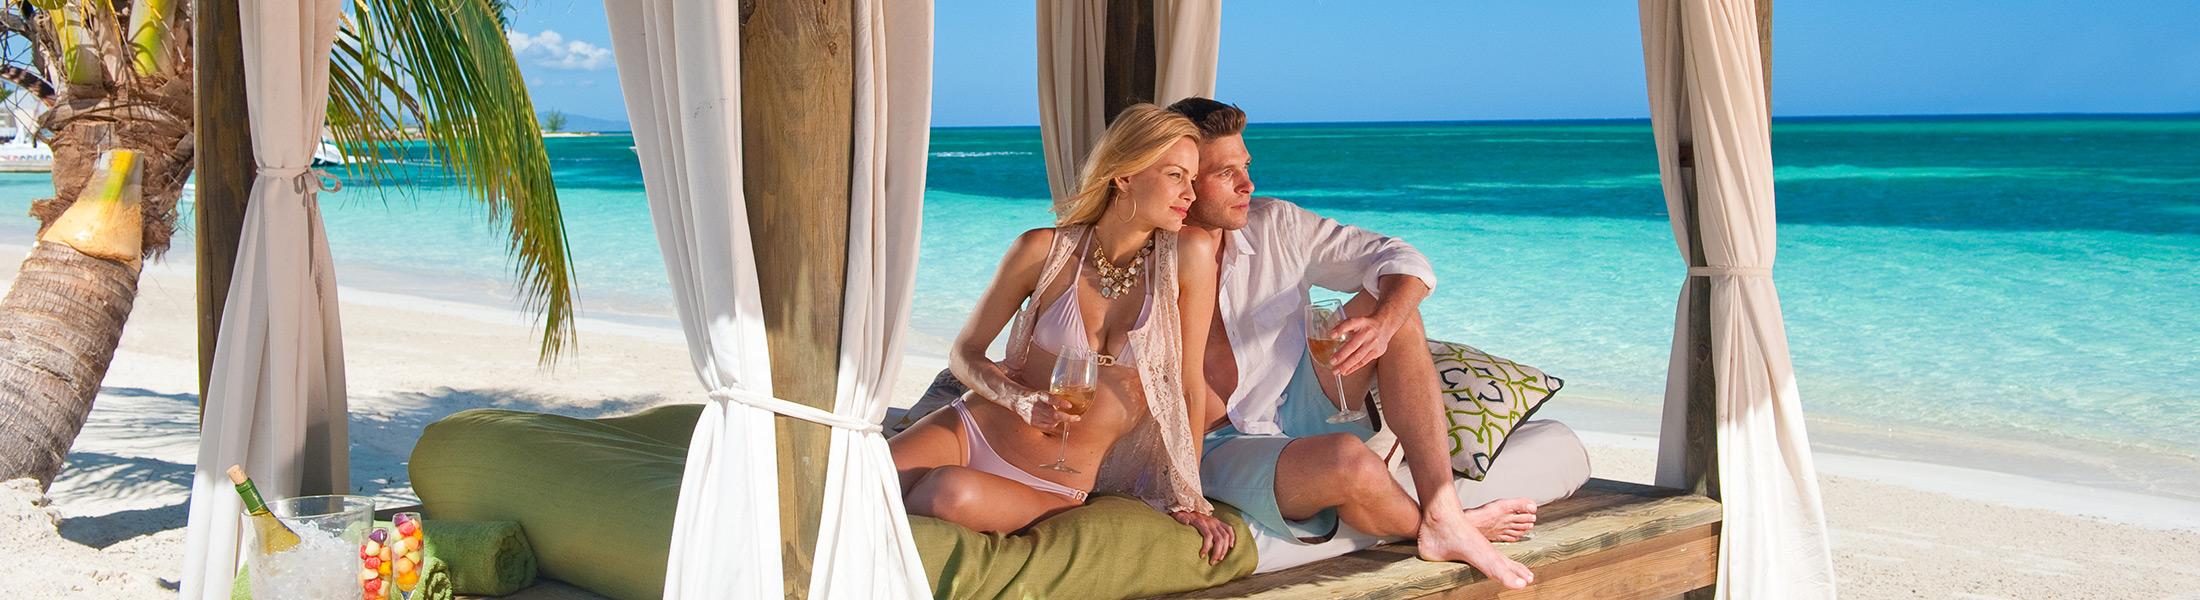 Couple on a beach cabana at Sandals Montego Bay